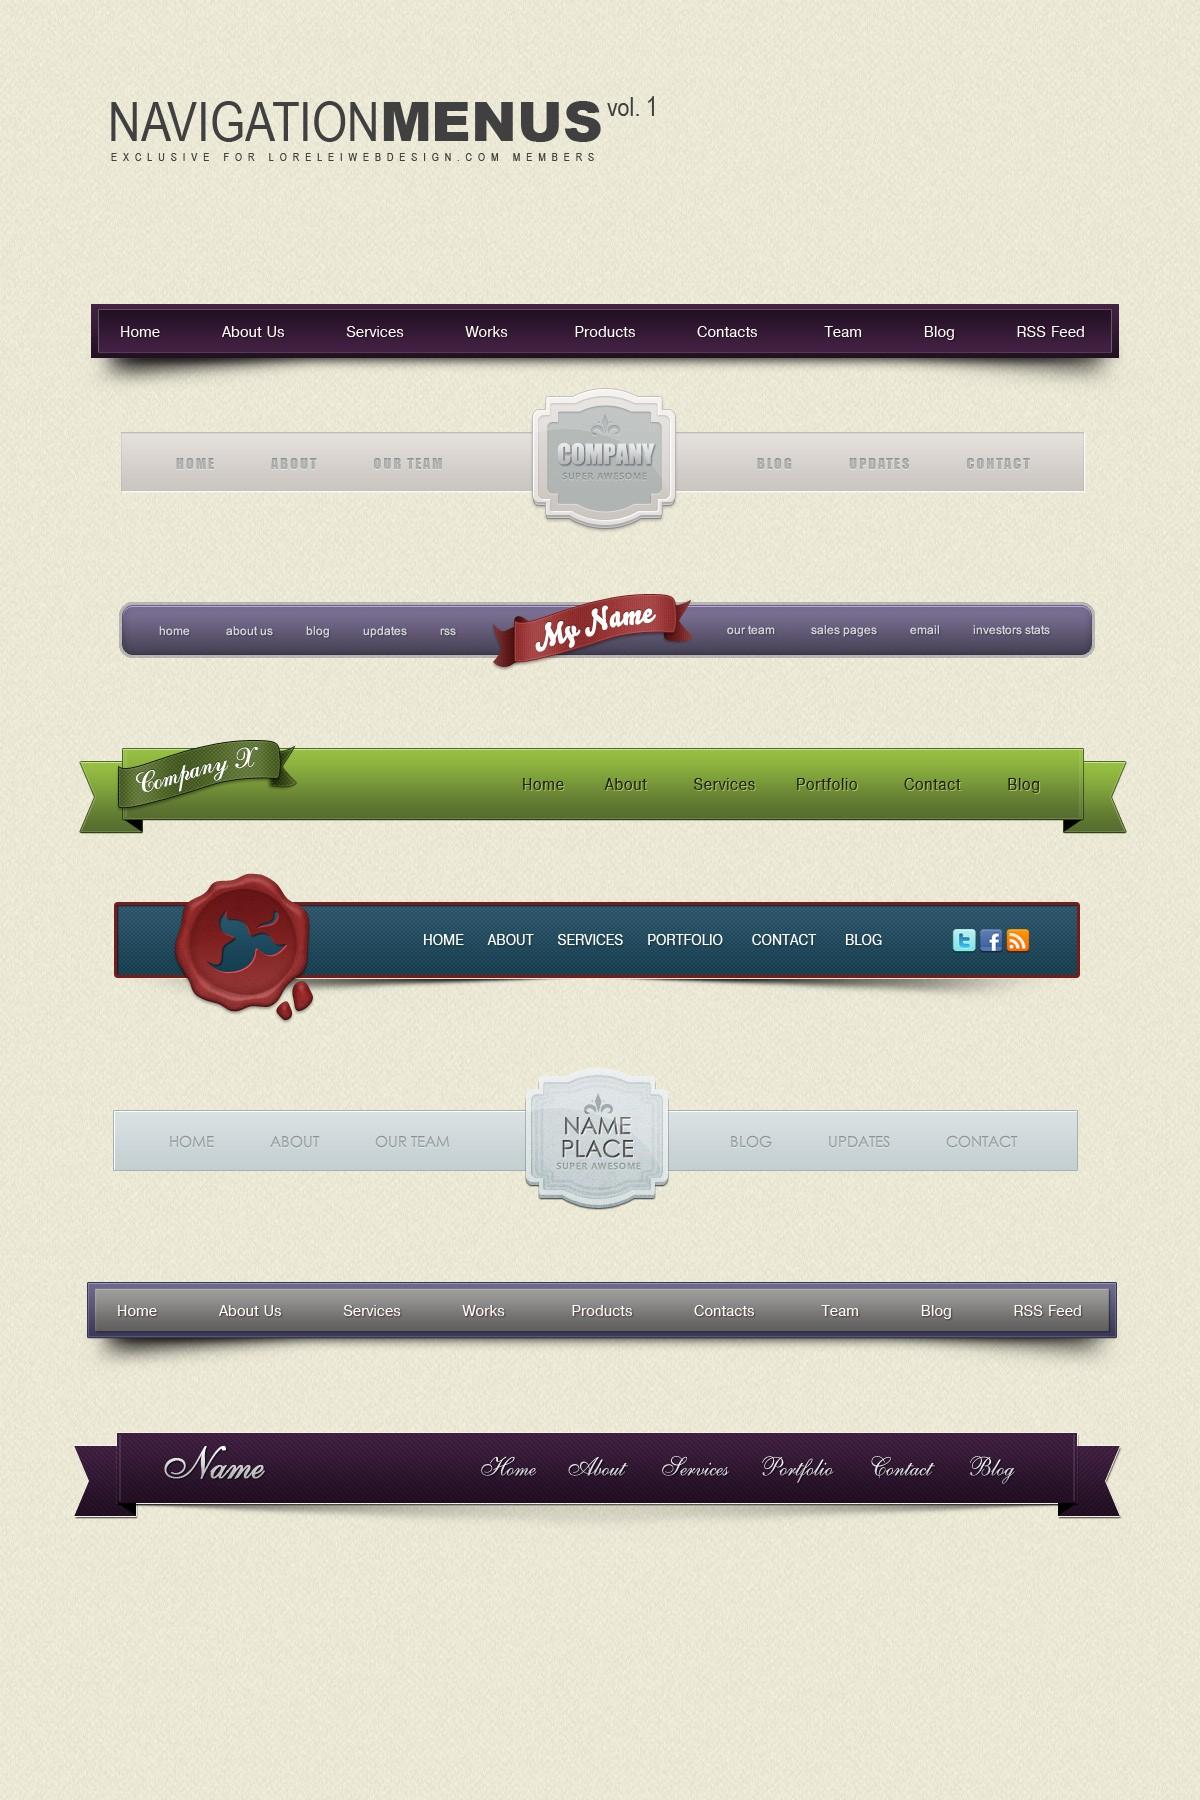 Premium Download: Navigation Menus Design - Volume 1 - Premium Downloads Lorelei Web Design